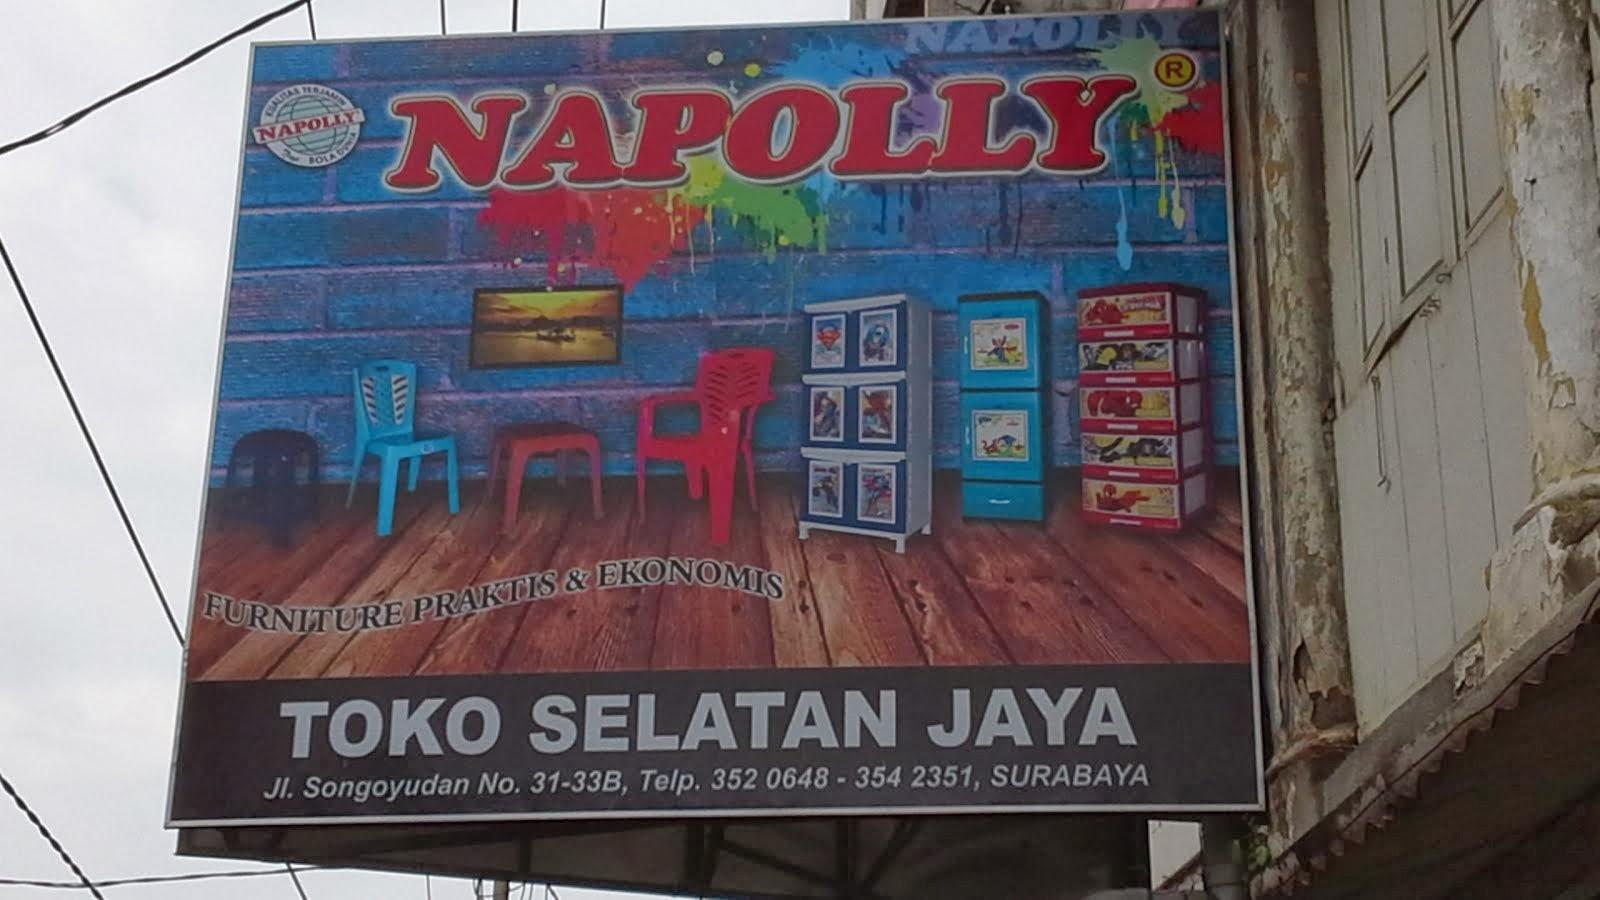 Selatan Jaya distributor barang plastik Surabaya